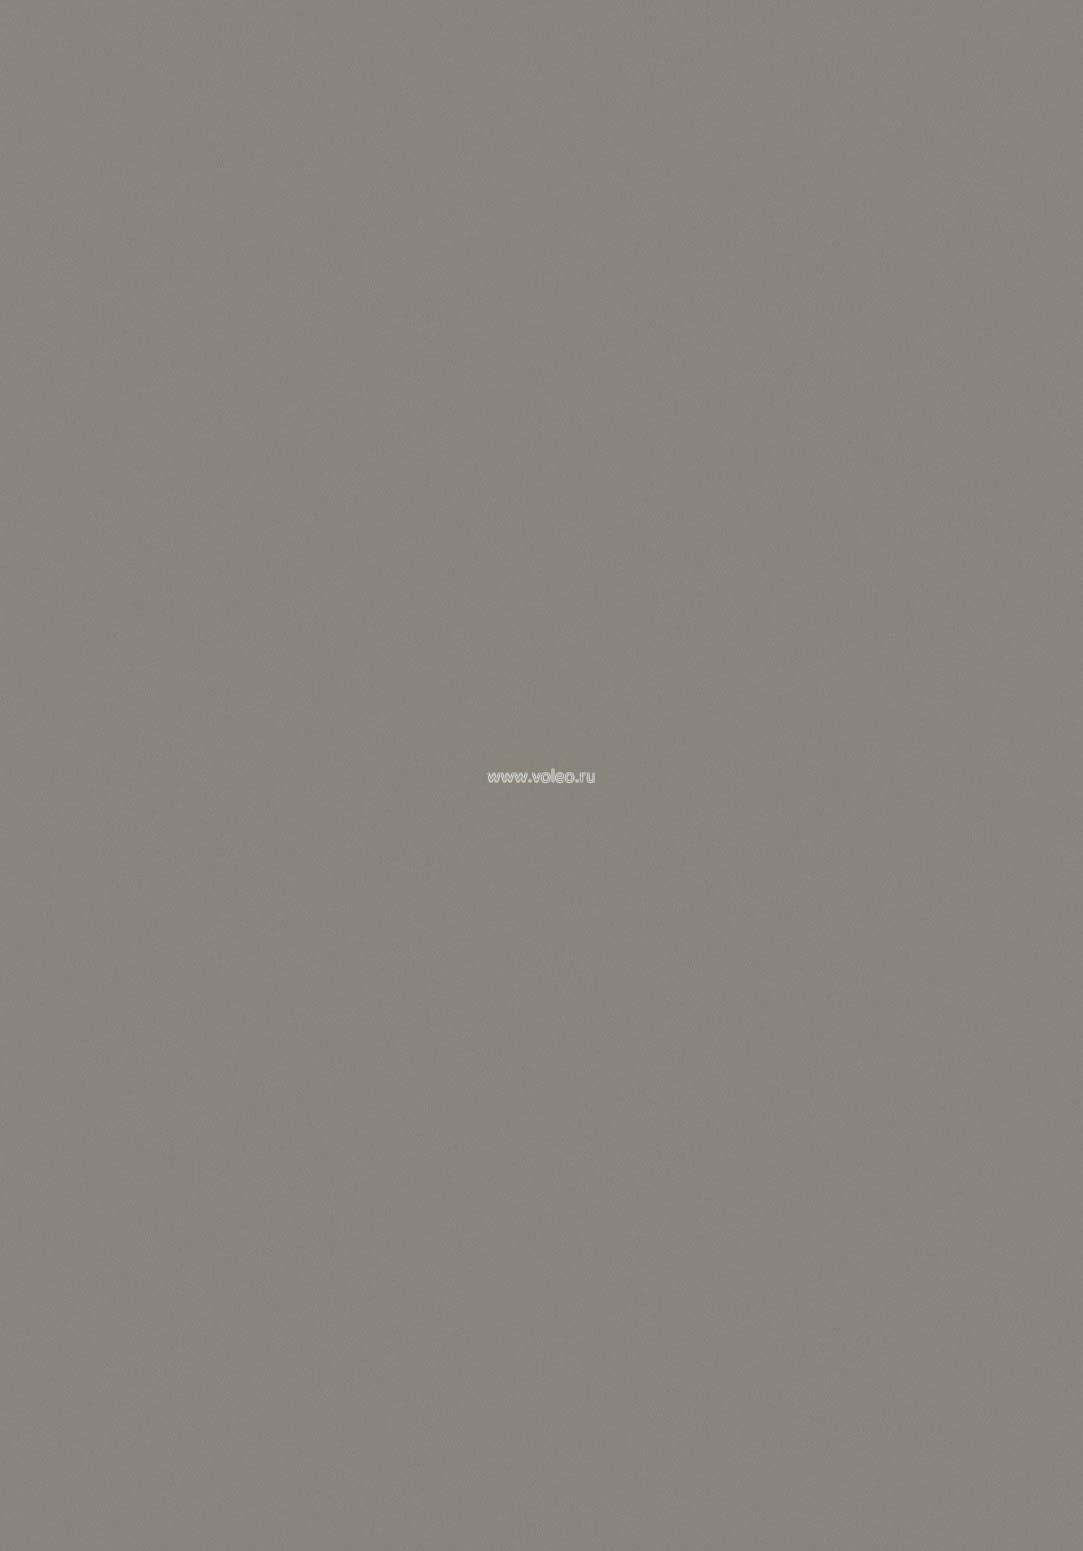 Обои Cole & Son Frontier 89/12050, интернет магазин Волео